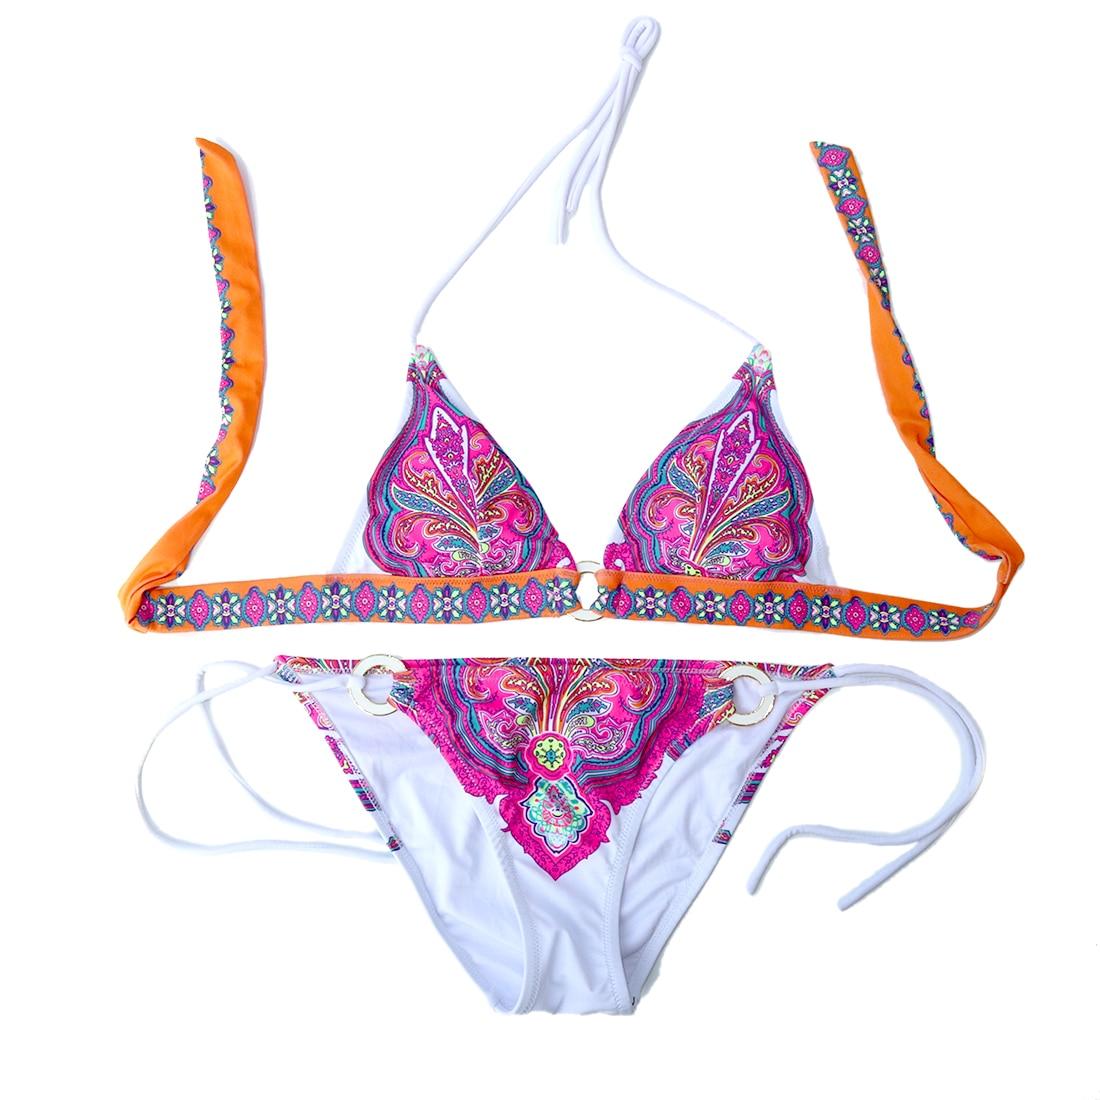 Women Bikini Pink Print Bikinis Swimsuit Vintage Swimming Suit Female Bathing Suit Sexy Swimwear Design Secret Thick Brazilian